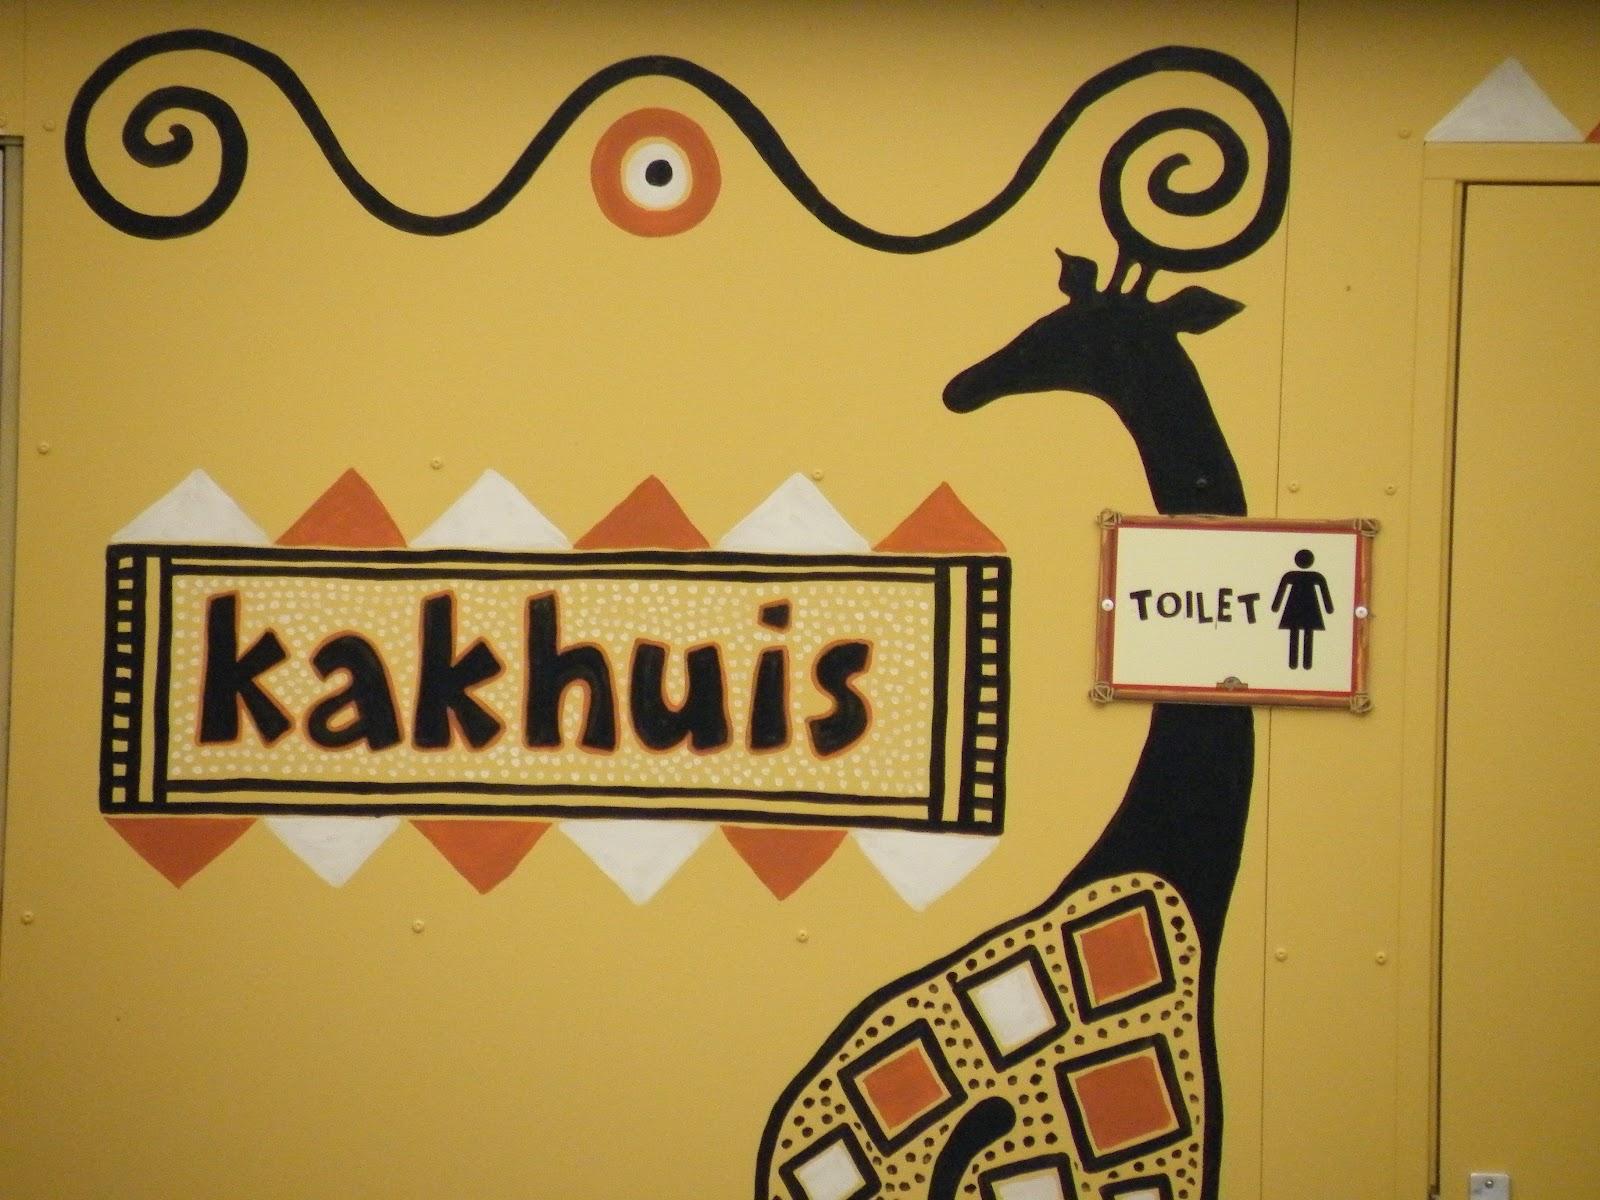 Org idee: kakhuis